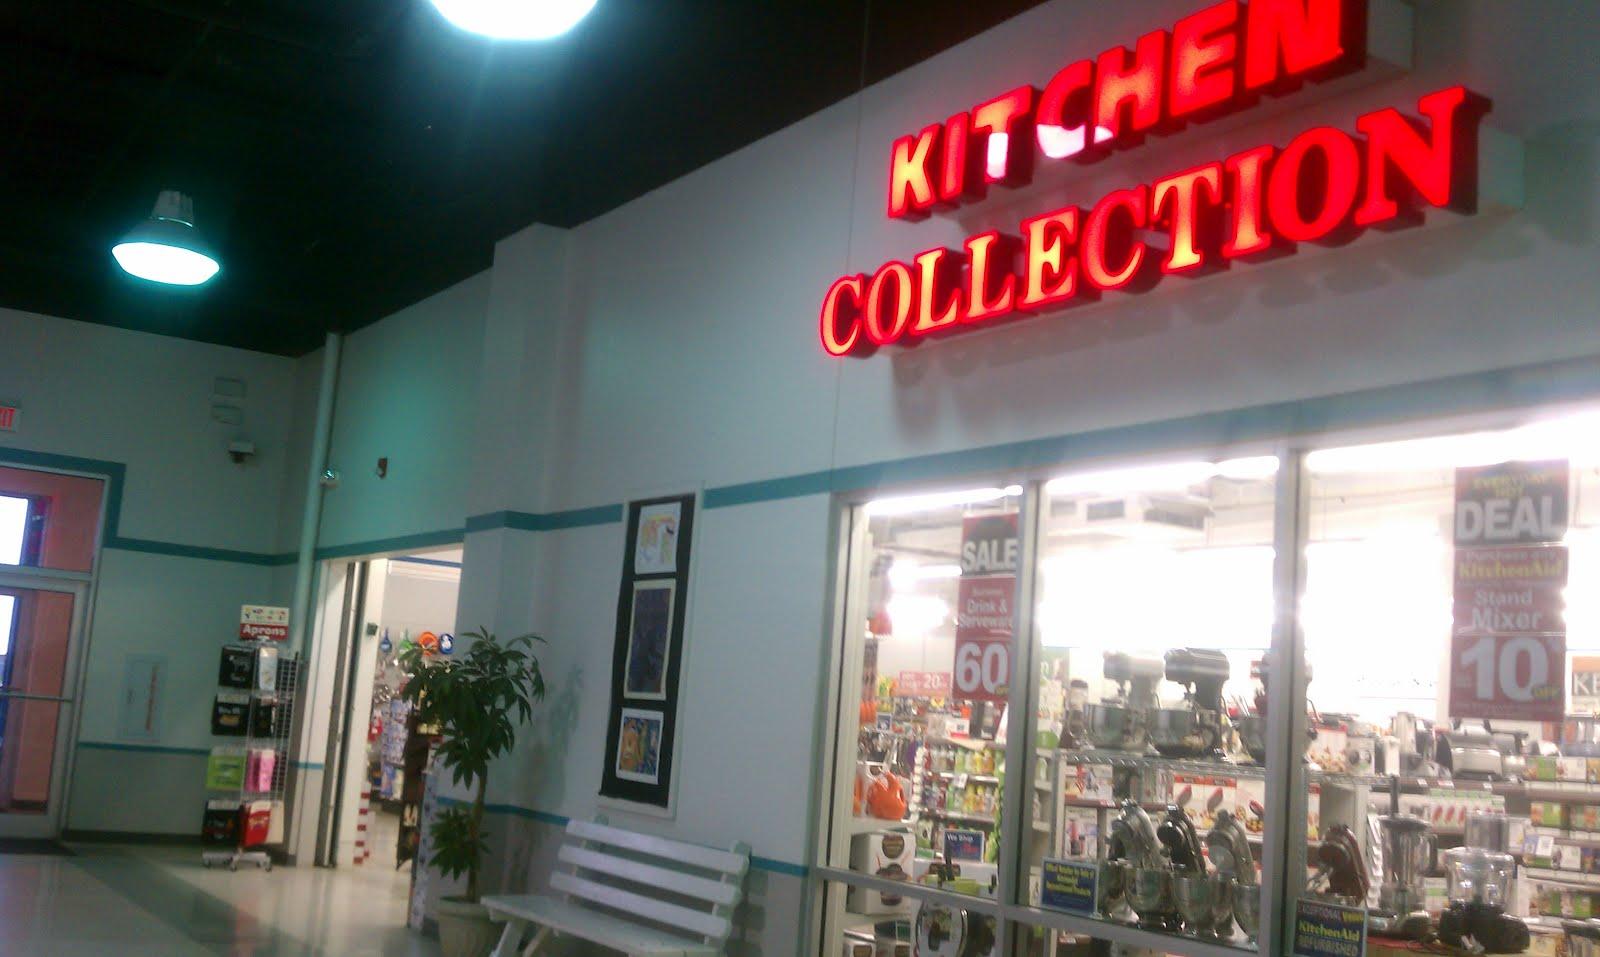 Iowa Outlet Mall, Iowa, Louisiana. 60 likes. Shopping Mall5/5(2).